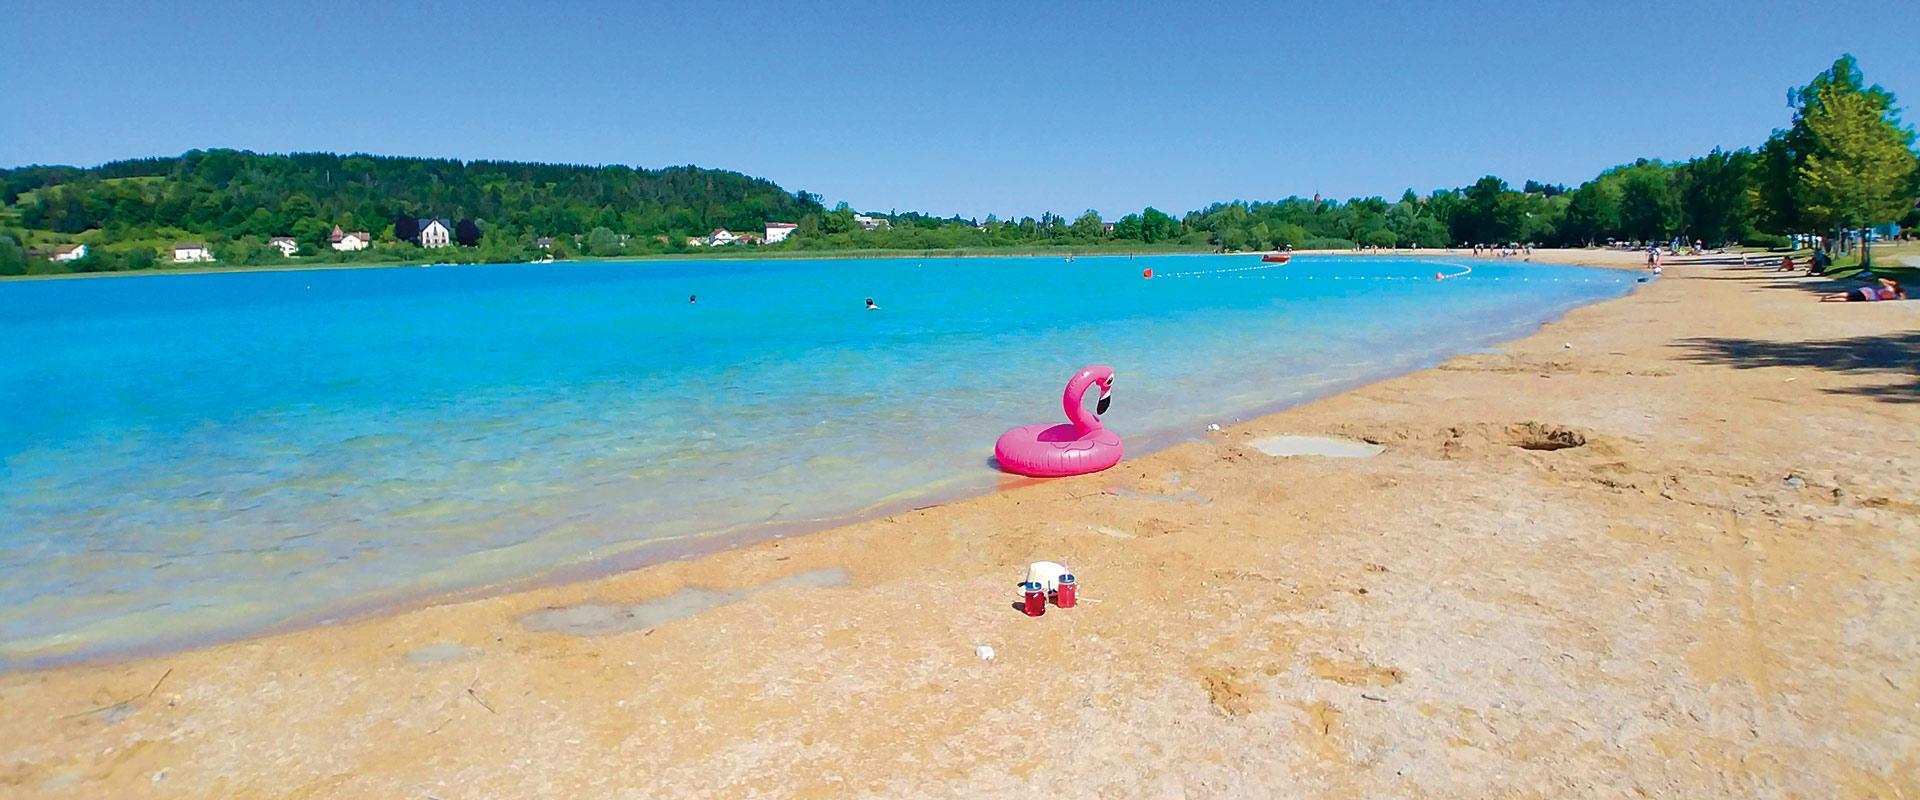 Camping jura avec piscine avec piscine 3 - Camping dordogne avec piscine et lac ...